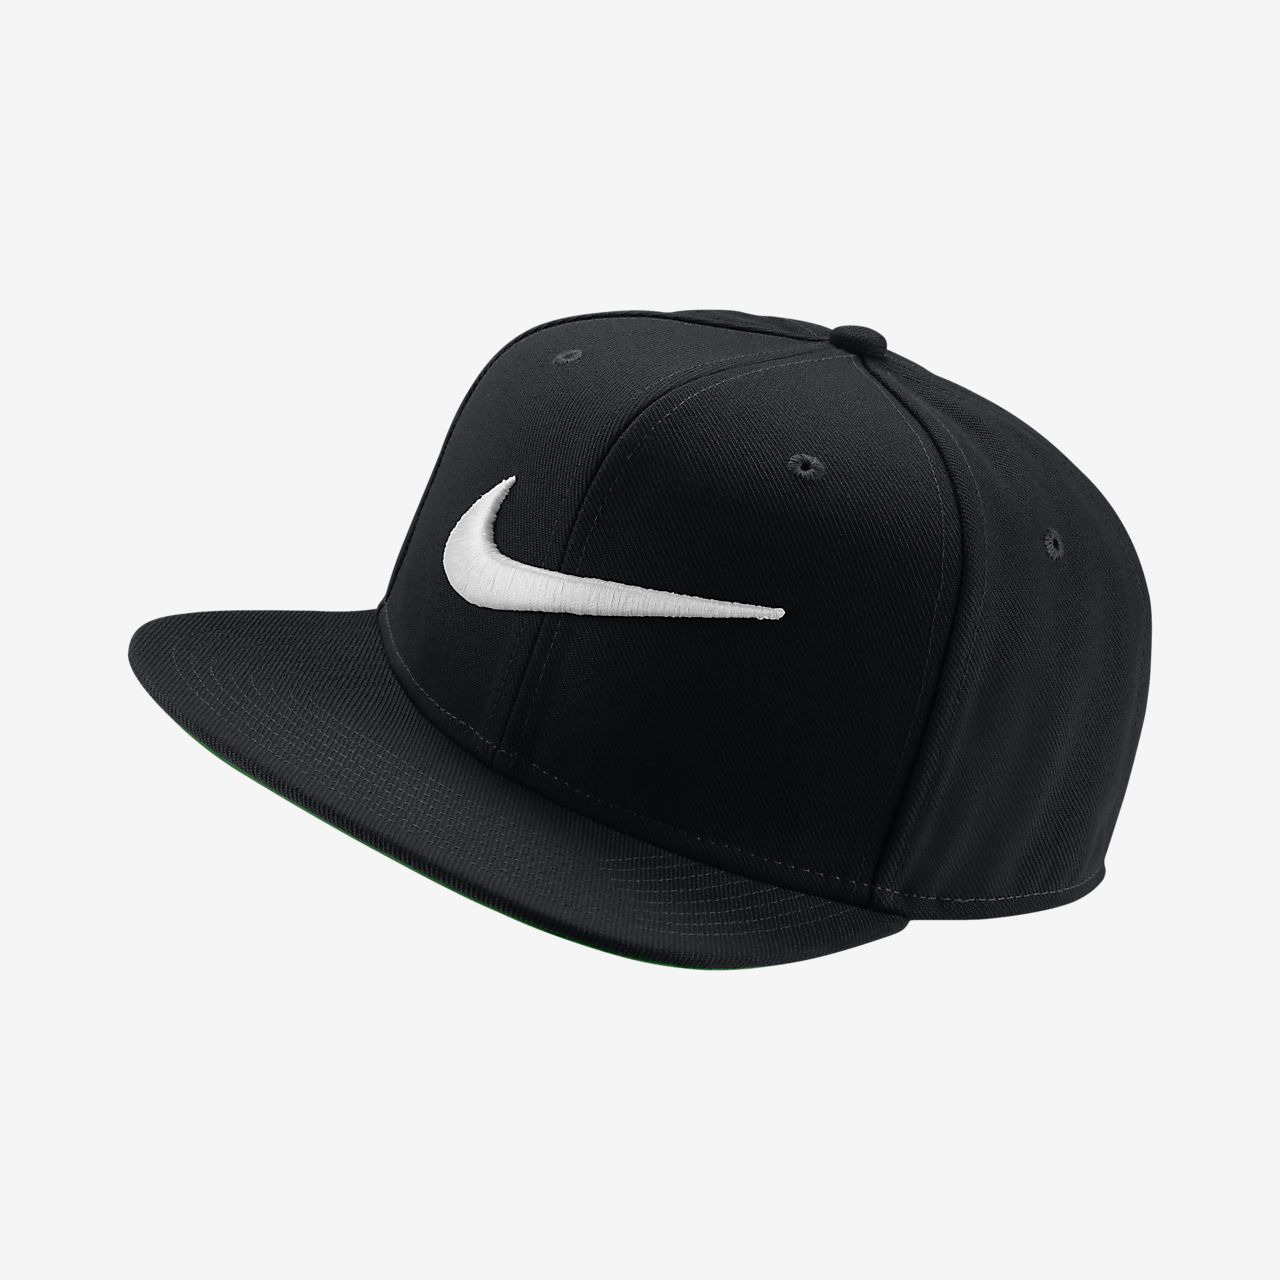 fb39409a37c96 Nike Sportswear Pro Swoosh Adjustable Hat. Nike.com VN